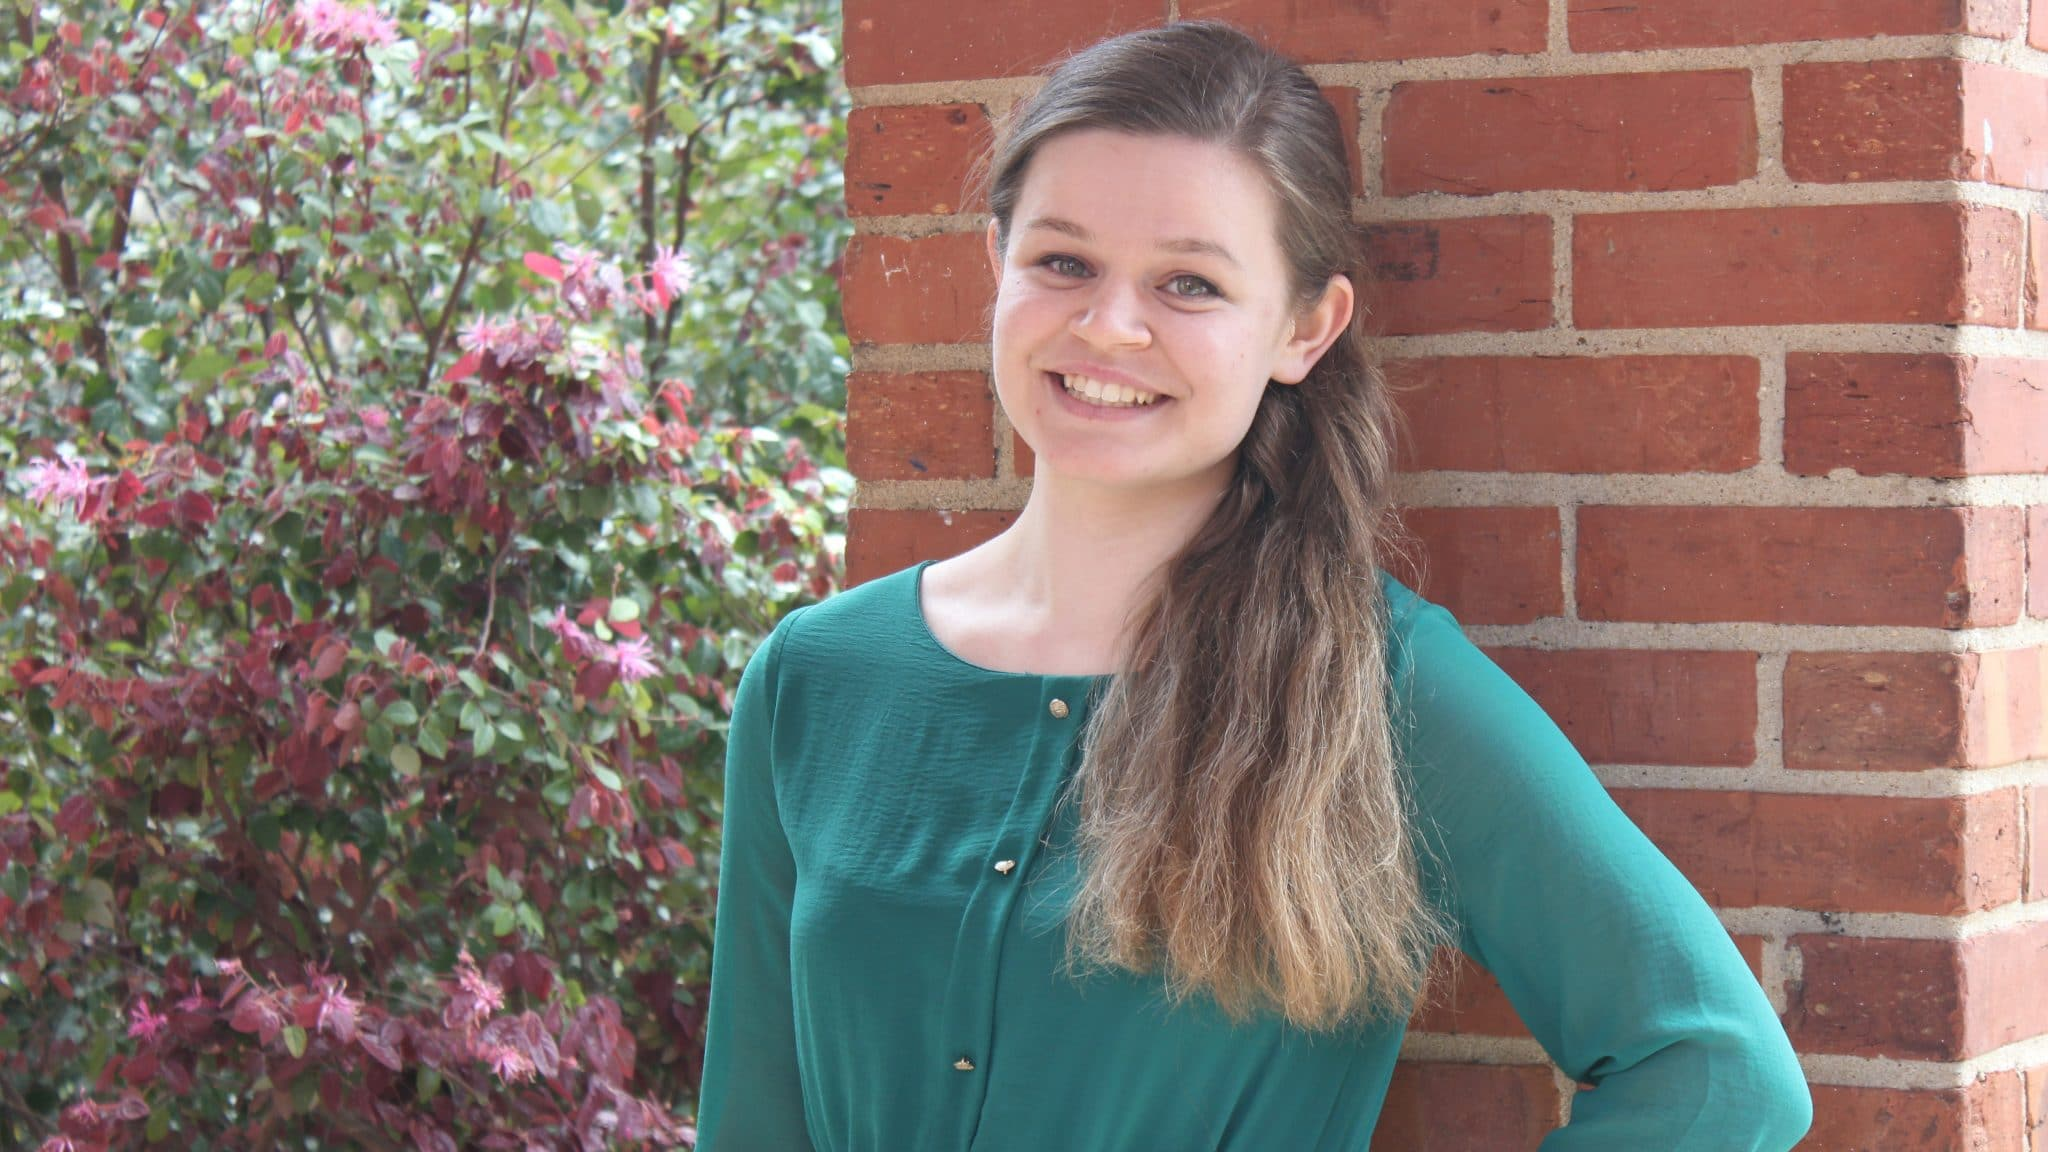 Meredith Bain, NC State Udall Scholar